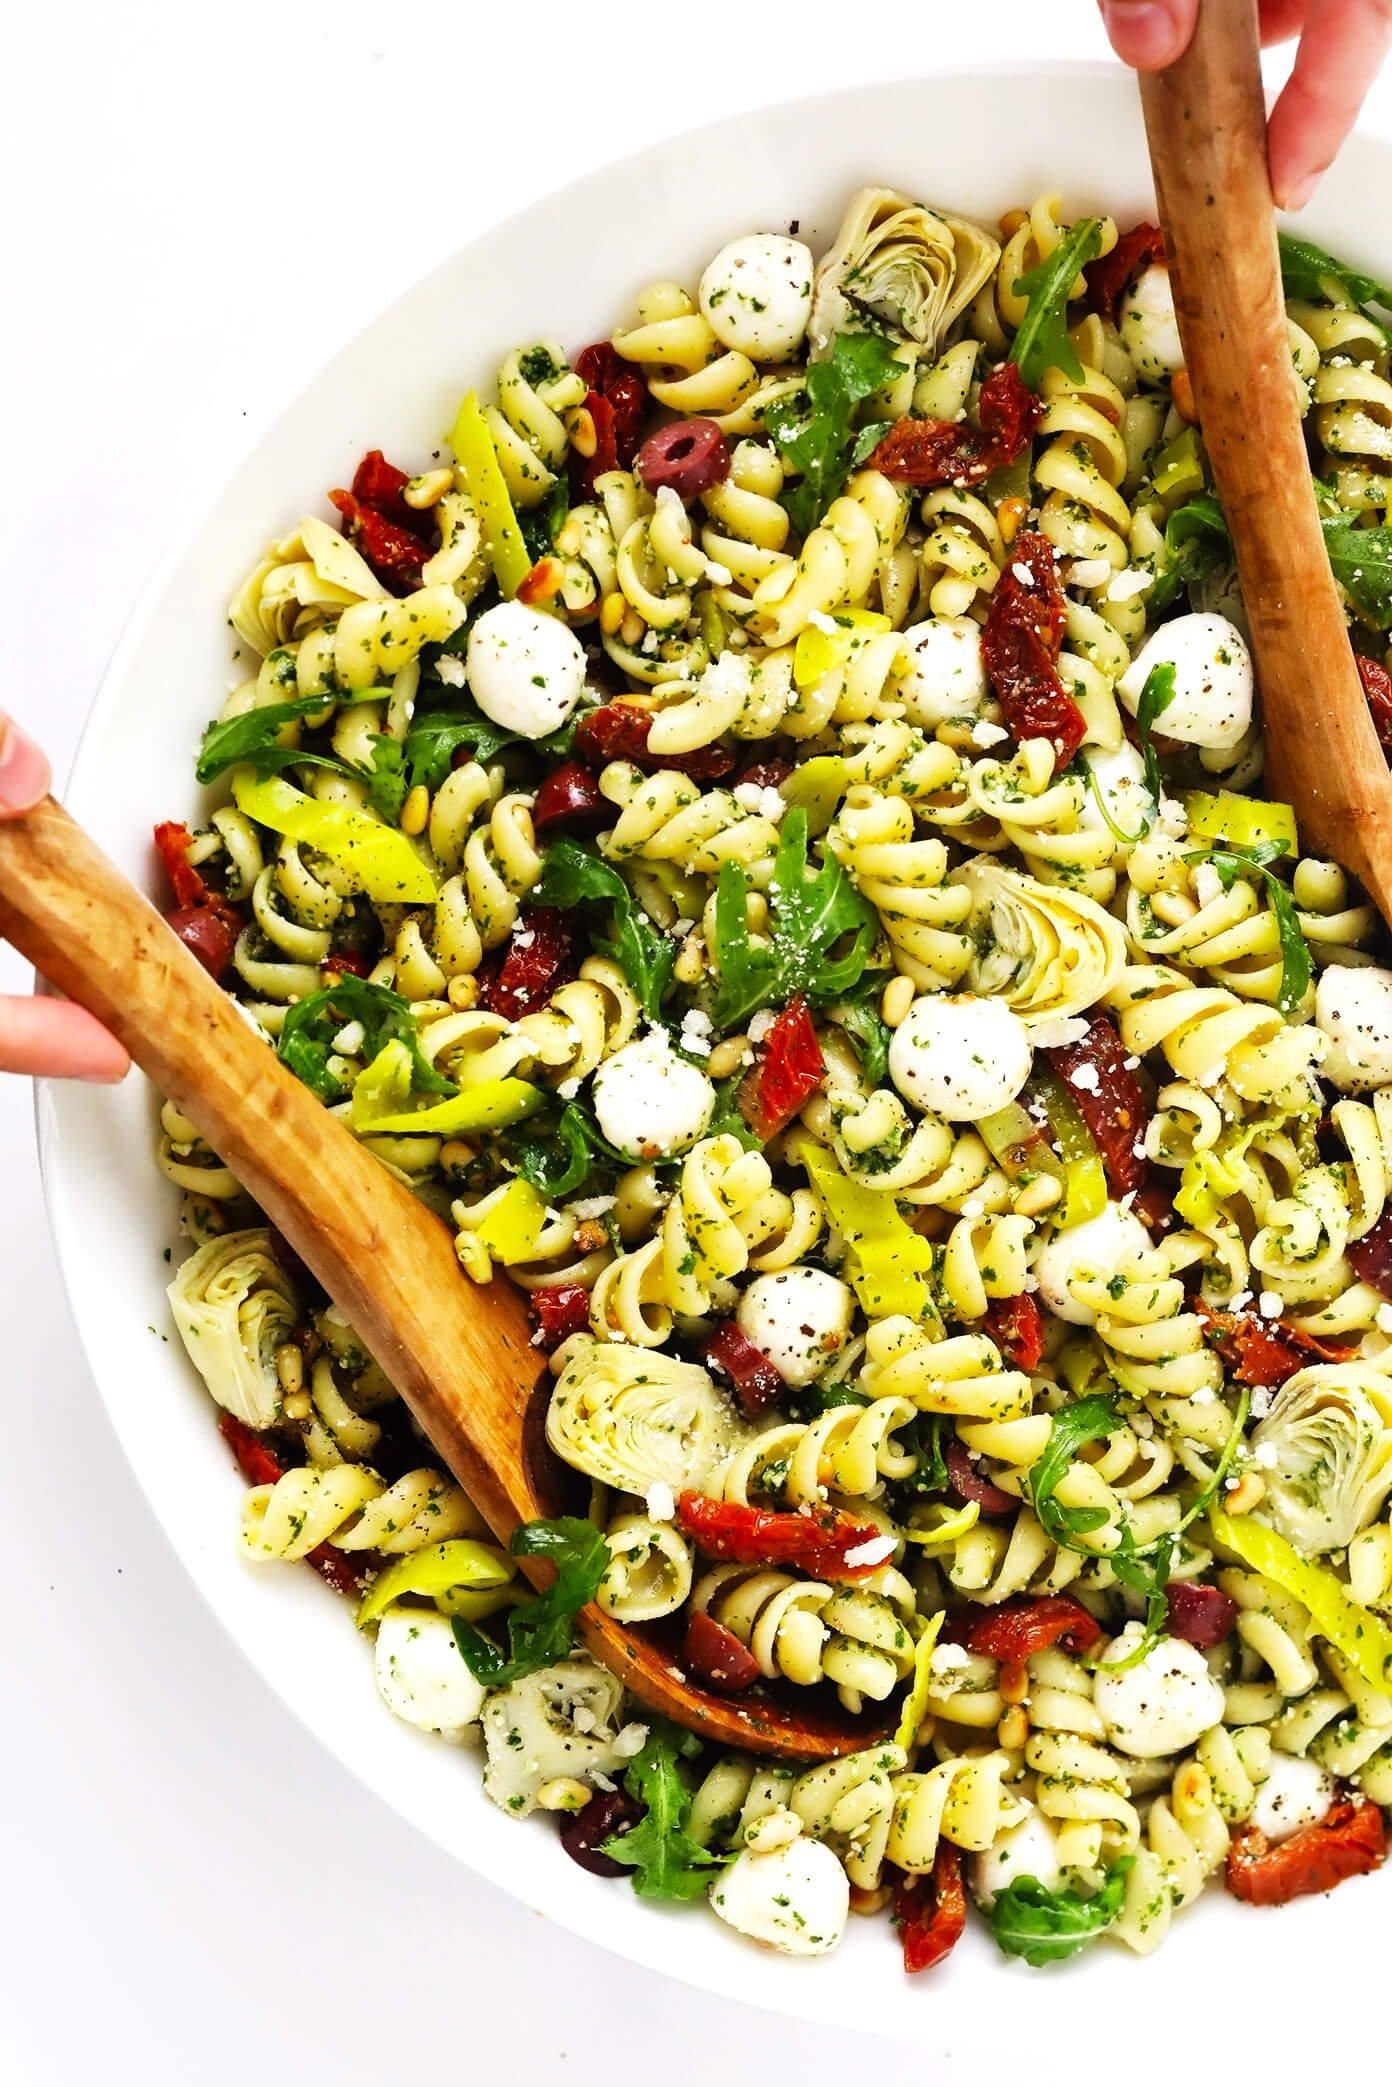 Italian Pesto Pasta Salad in Bowl with Tongs